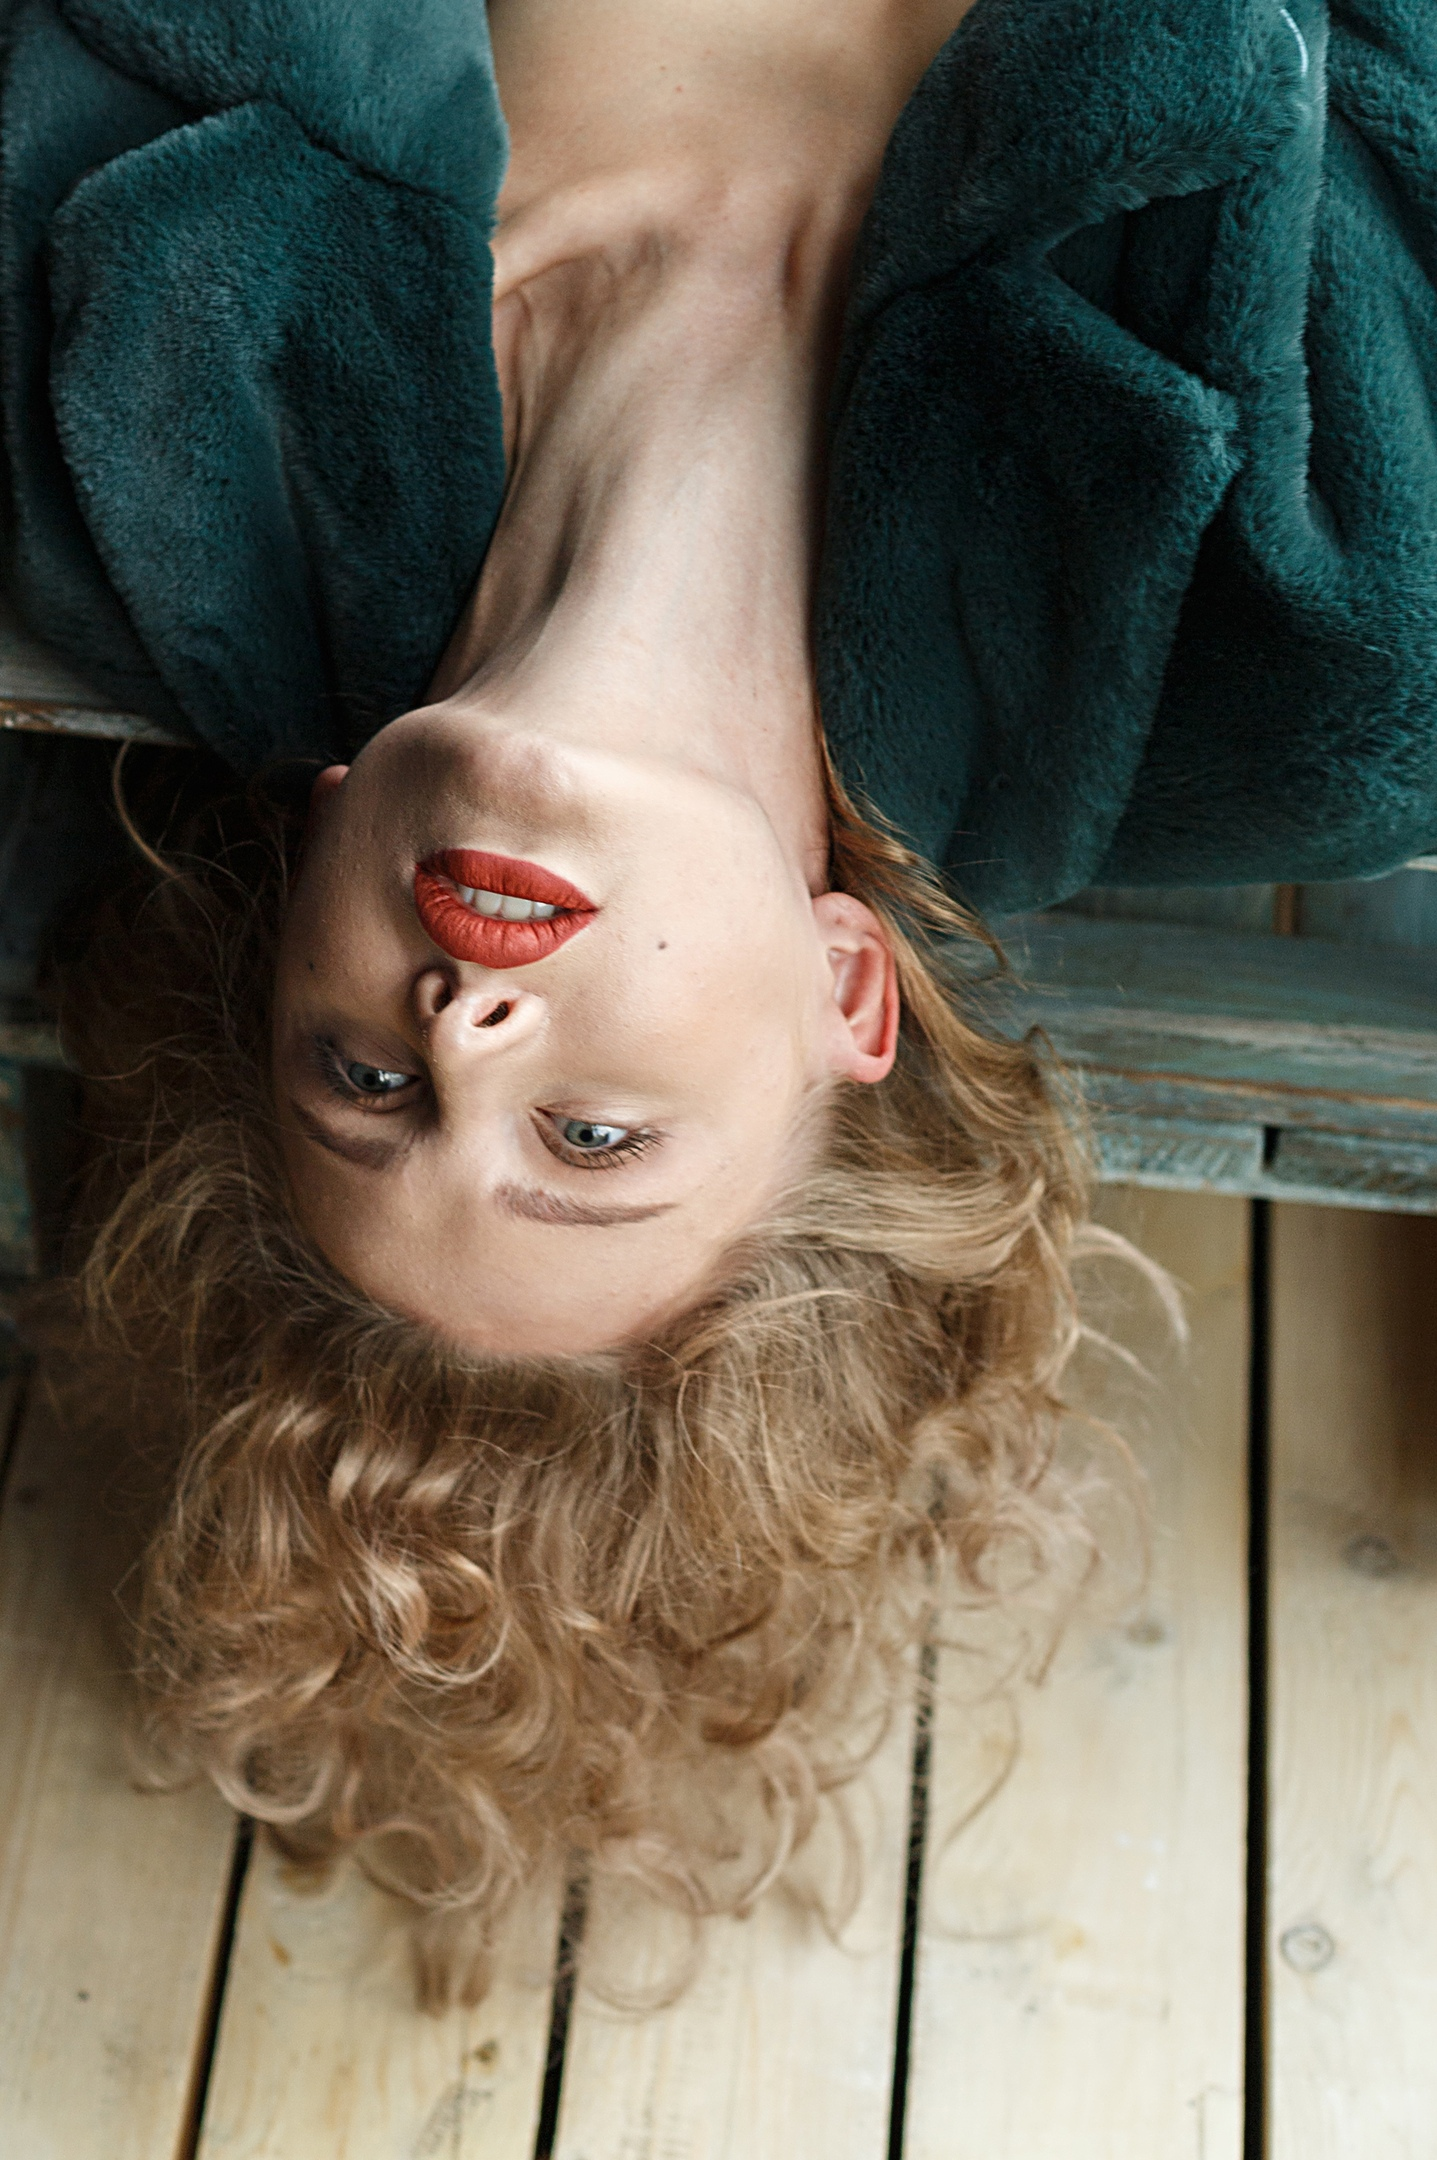 https://youngfolks.ru/pub/model-natalya-gromova-model-saule-khaliullina